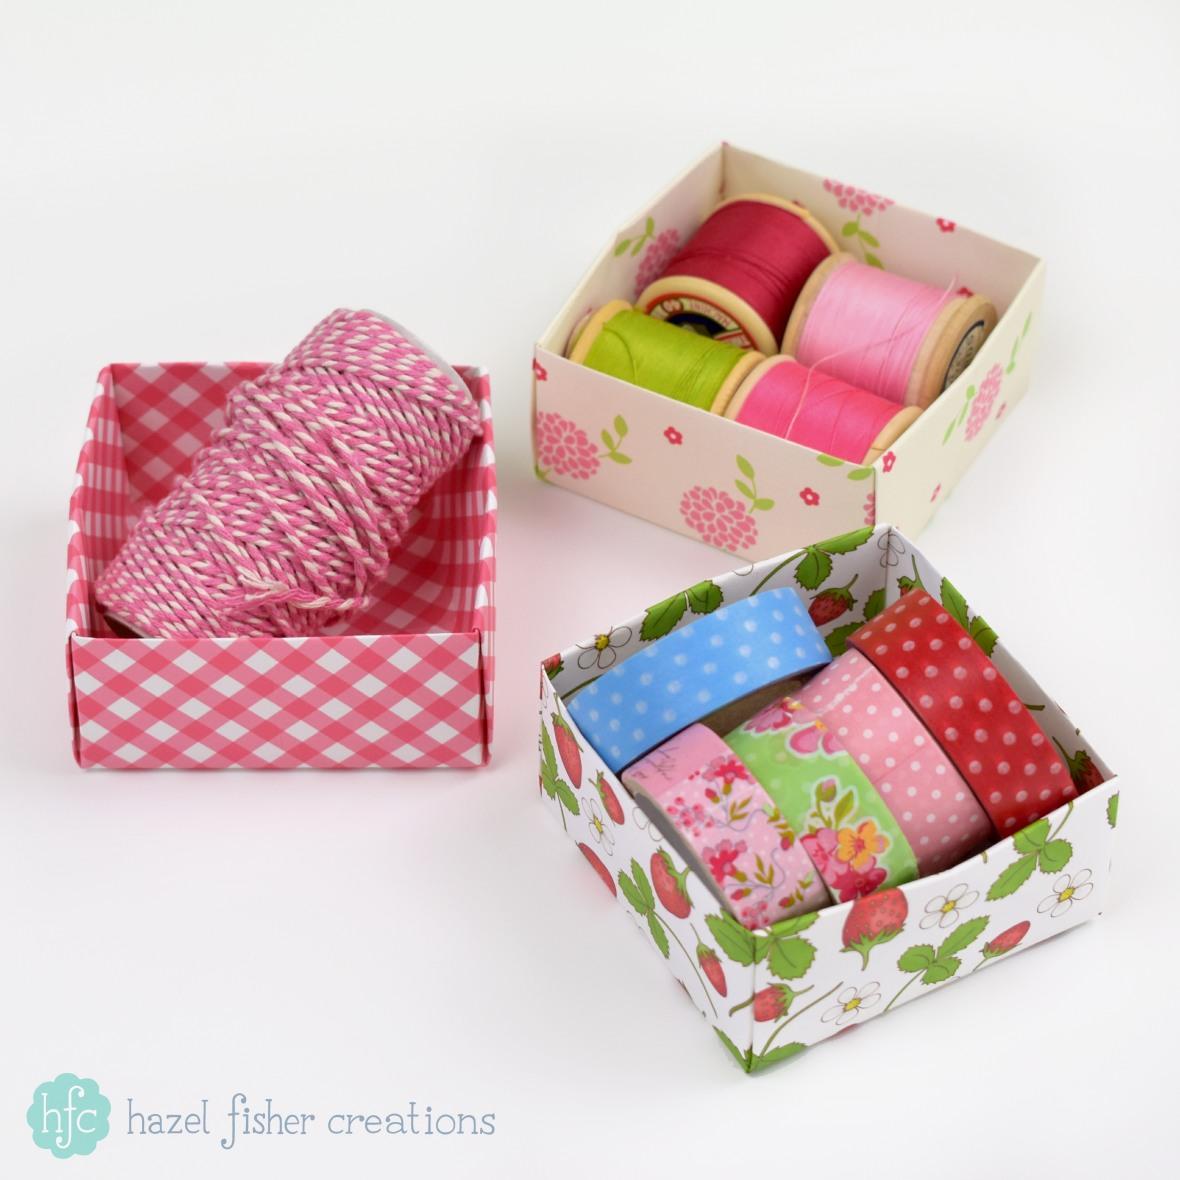 Hazel Fisher Creations: Origami Box Tutorial - photo#11